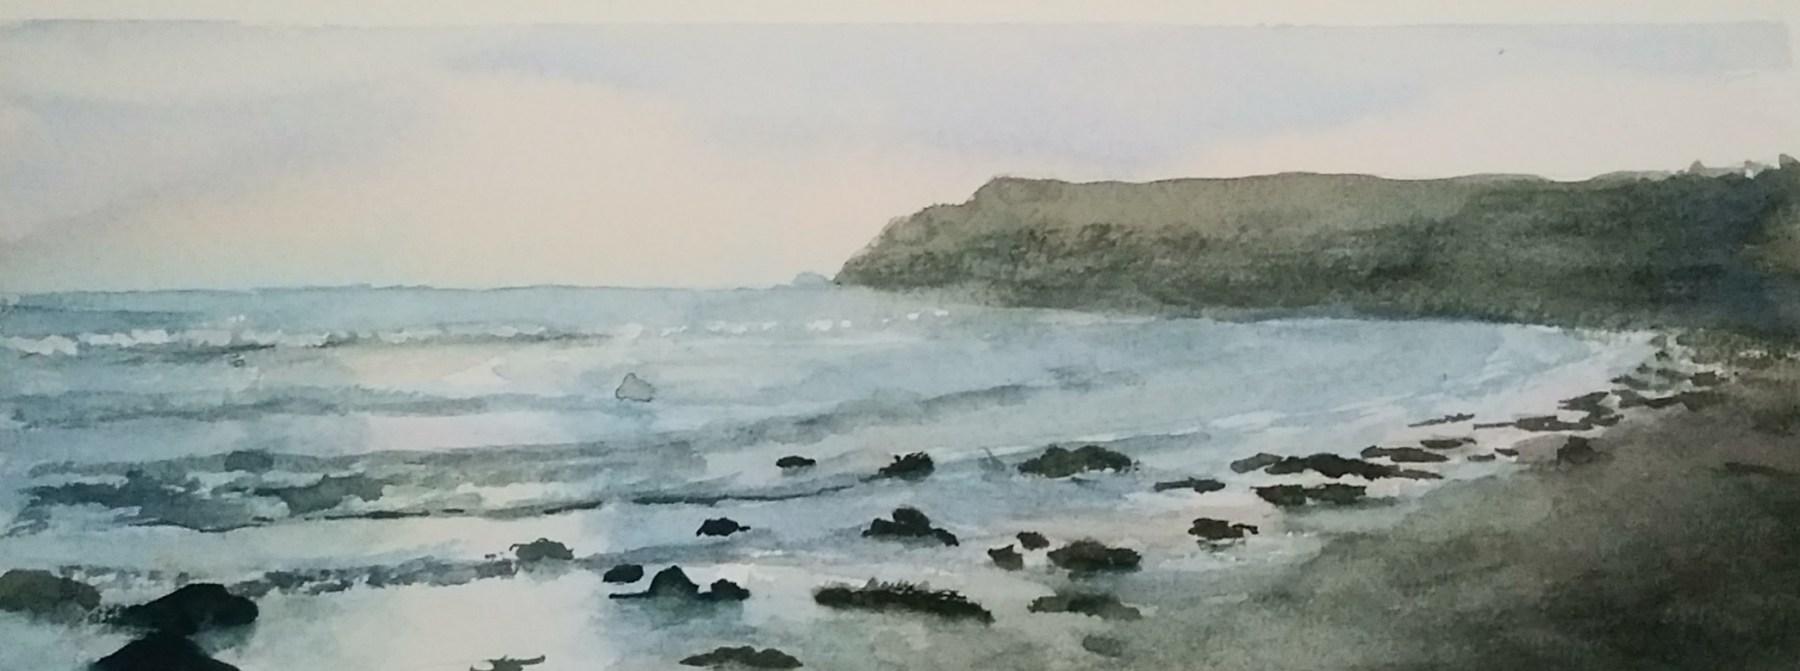 Beachcomber Beach - Eric Harvey